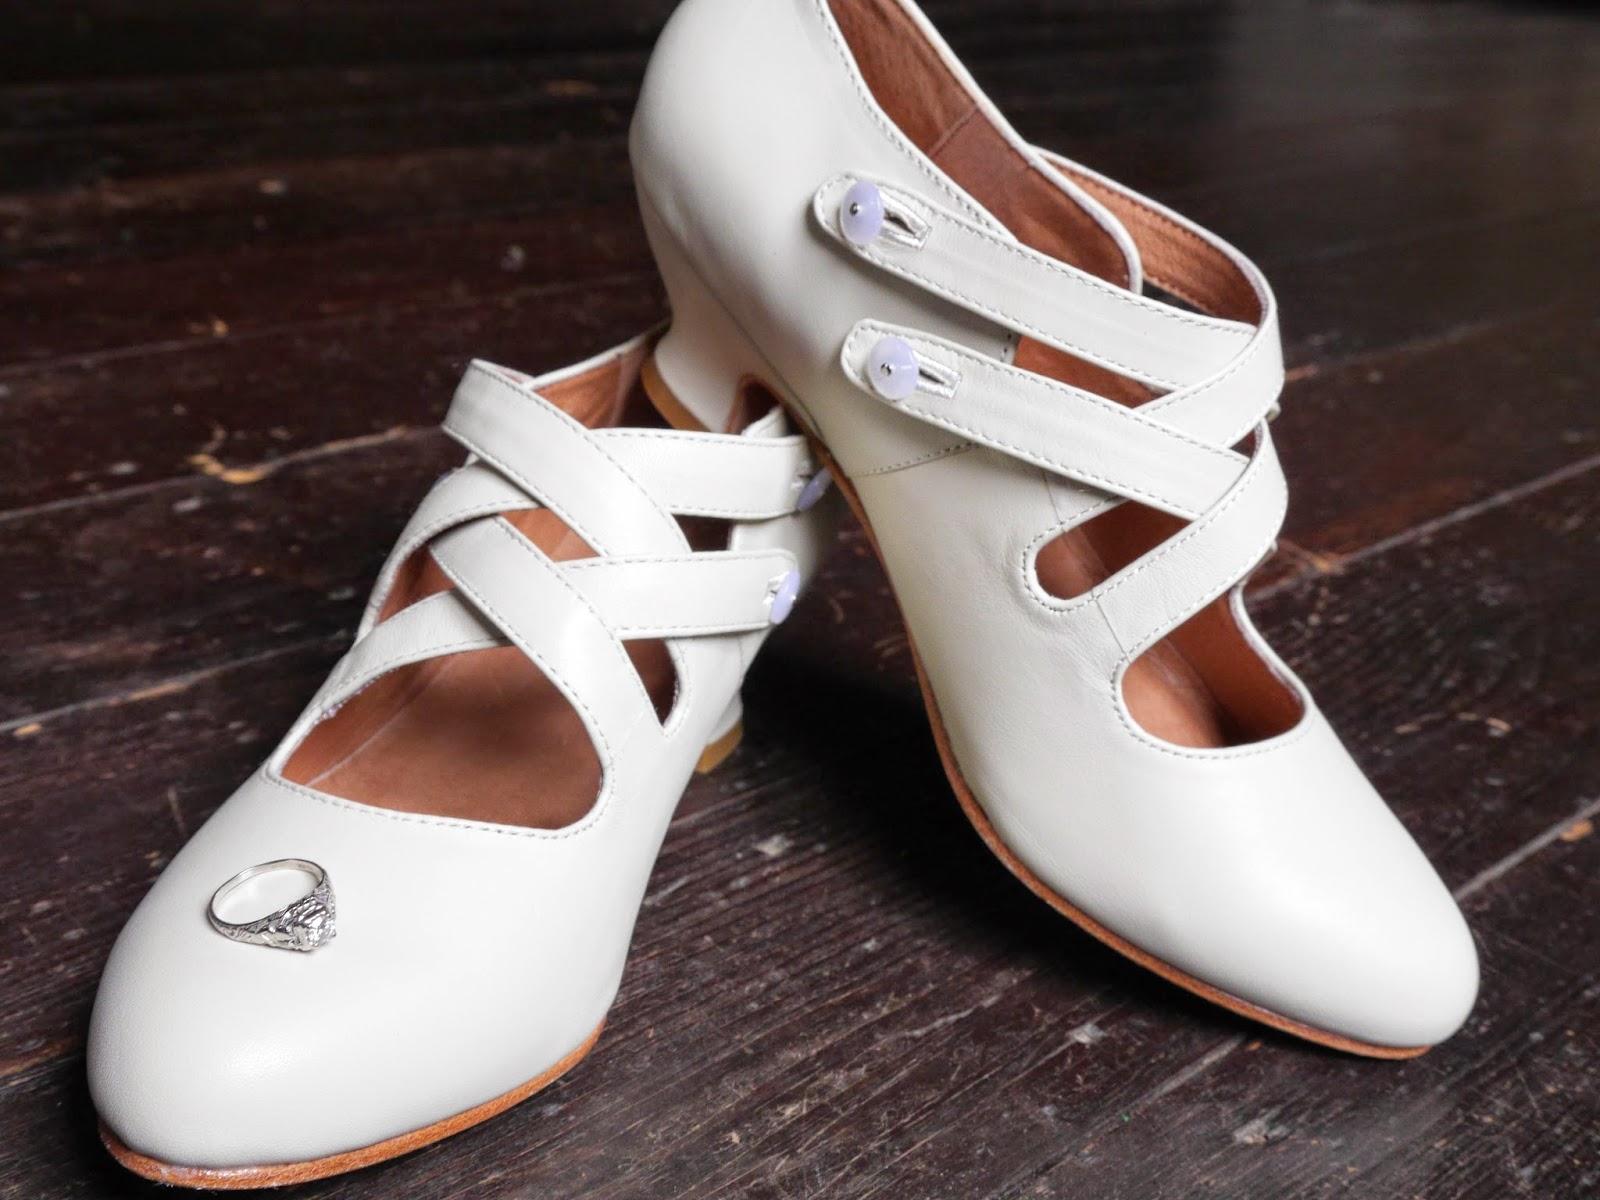 http://www.american-duchess.com/edwardian-victorian-shoes-boots/astoria-womens-edwardian-shoe